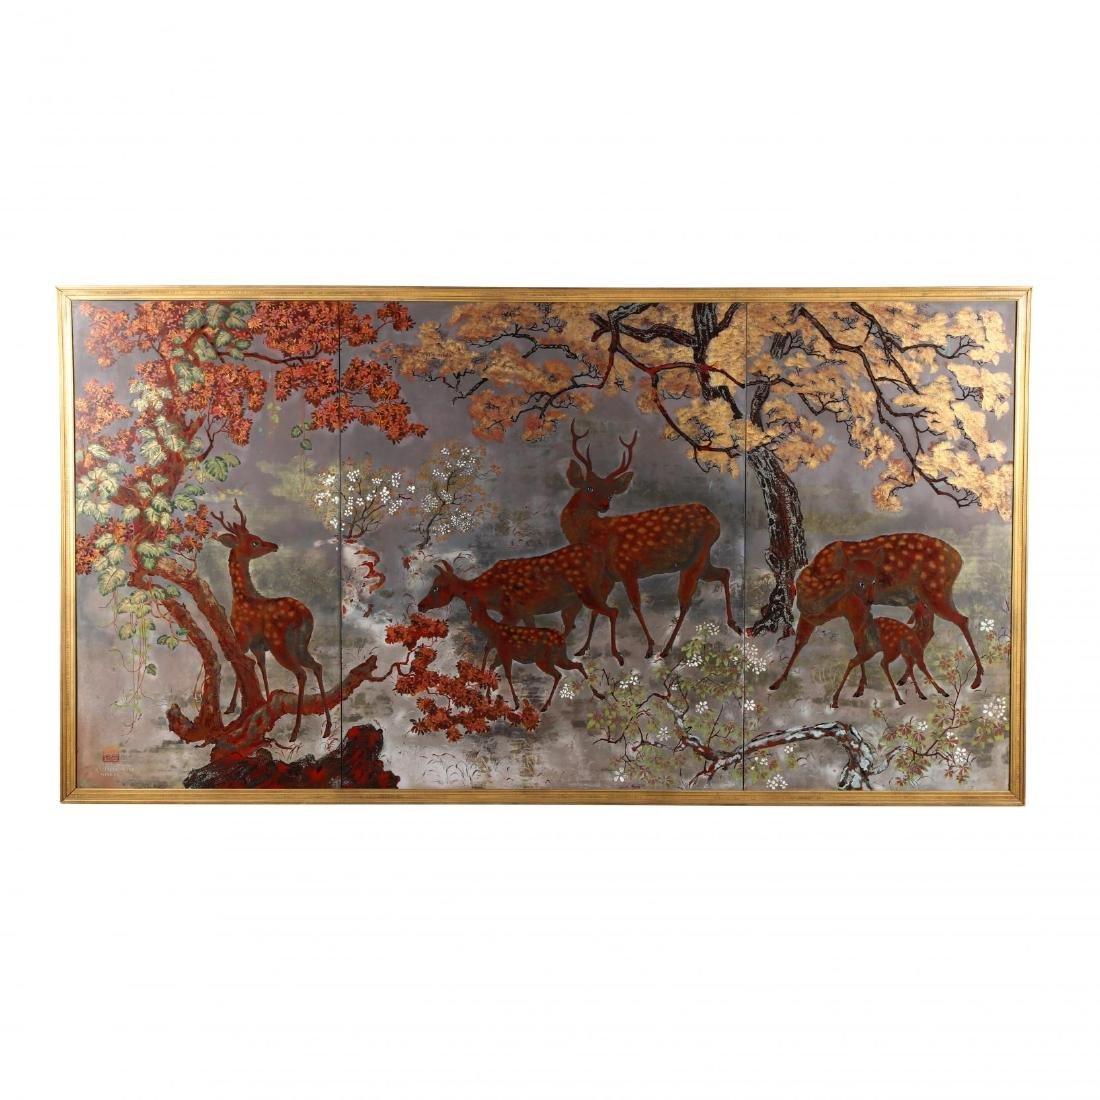 Tran Dzu Hong (Vietnamese, 1922-2002), A Painting of